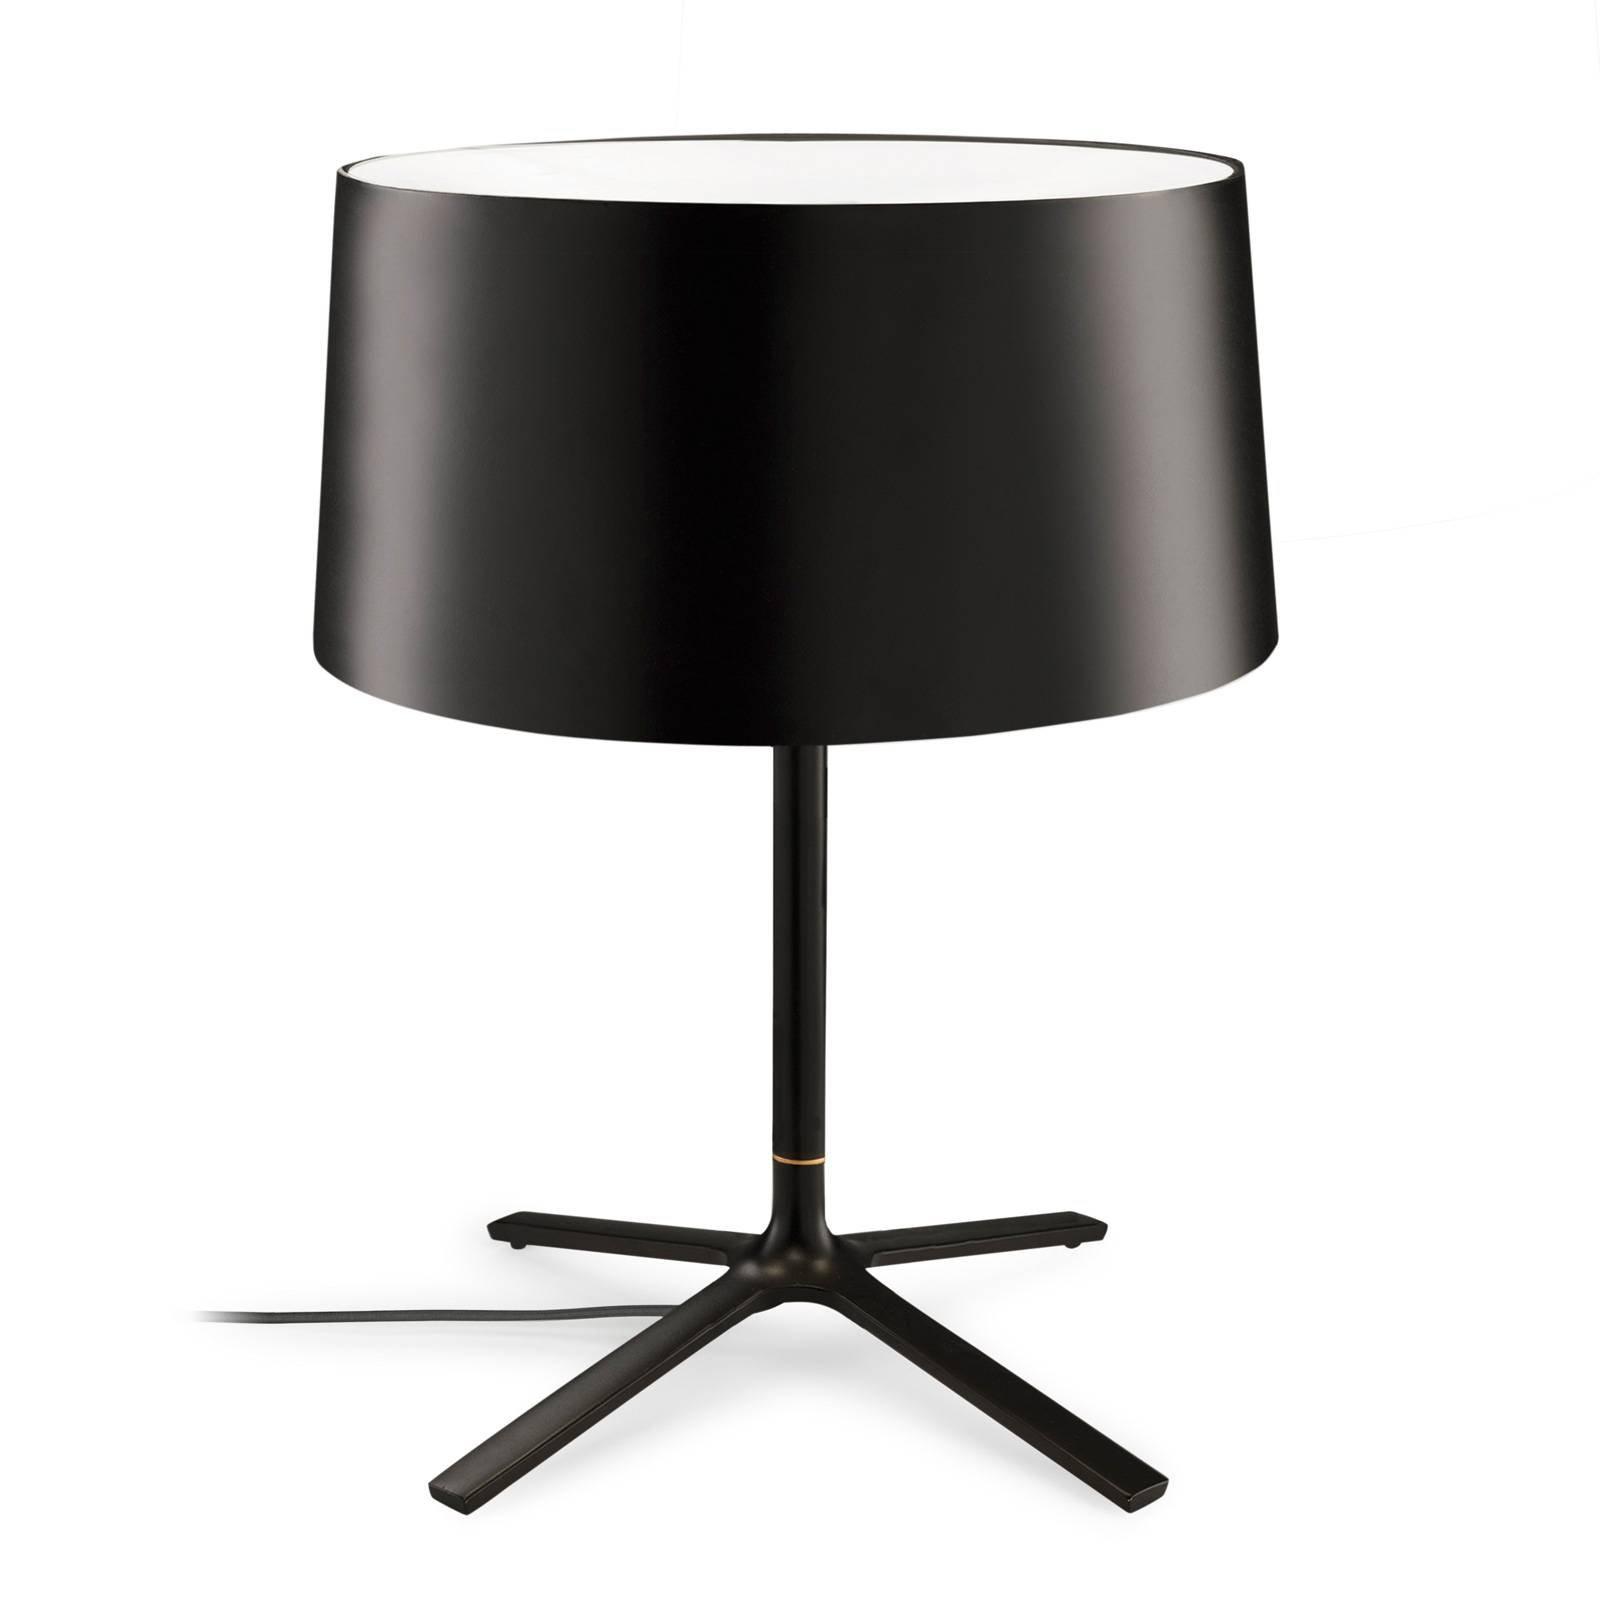 Grok Hall bordlampe med stoffskjerm, svart